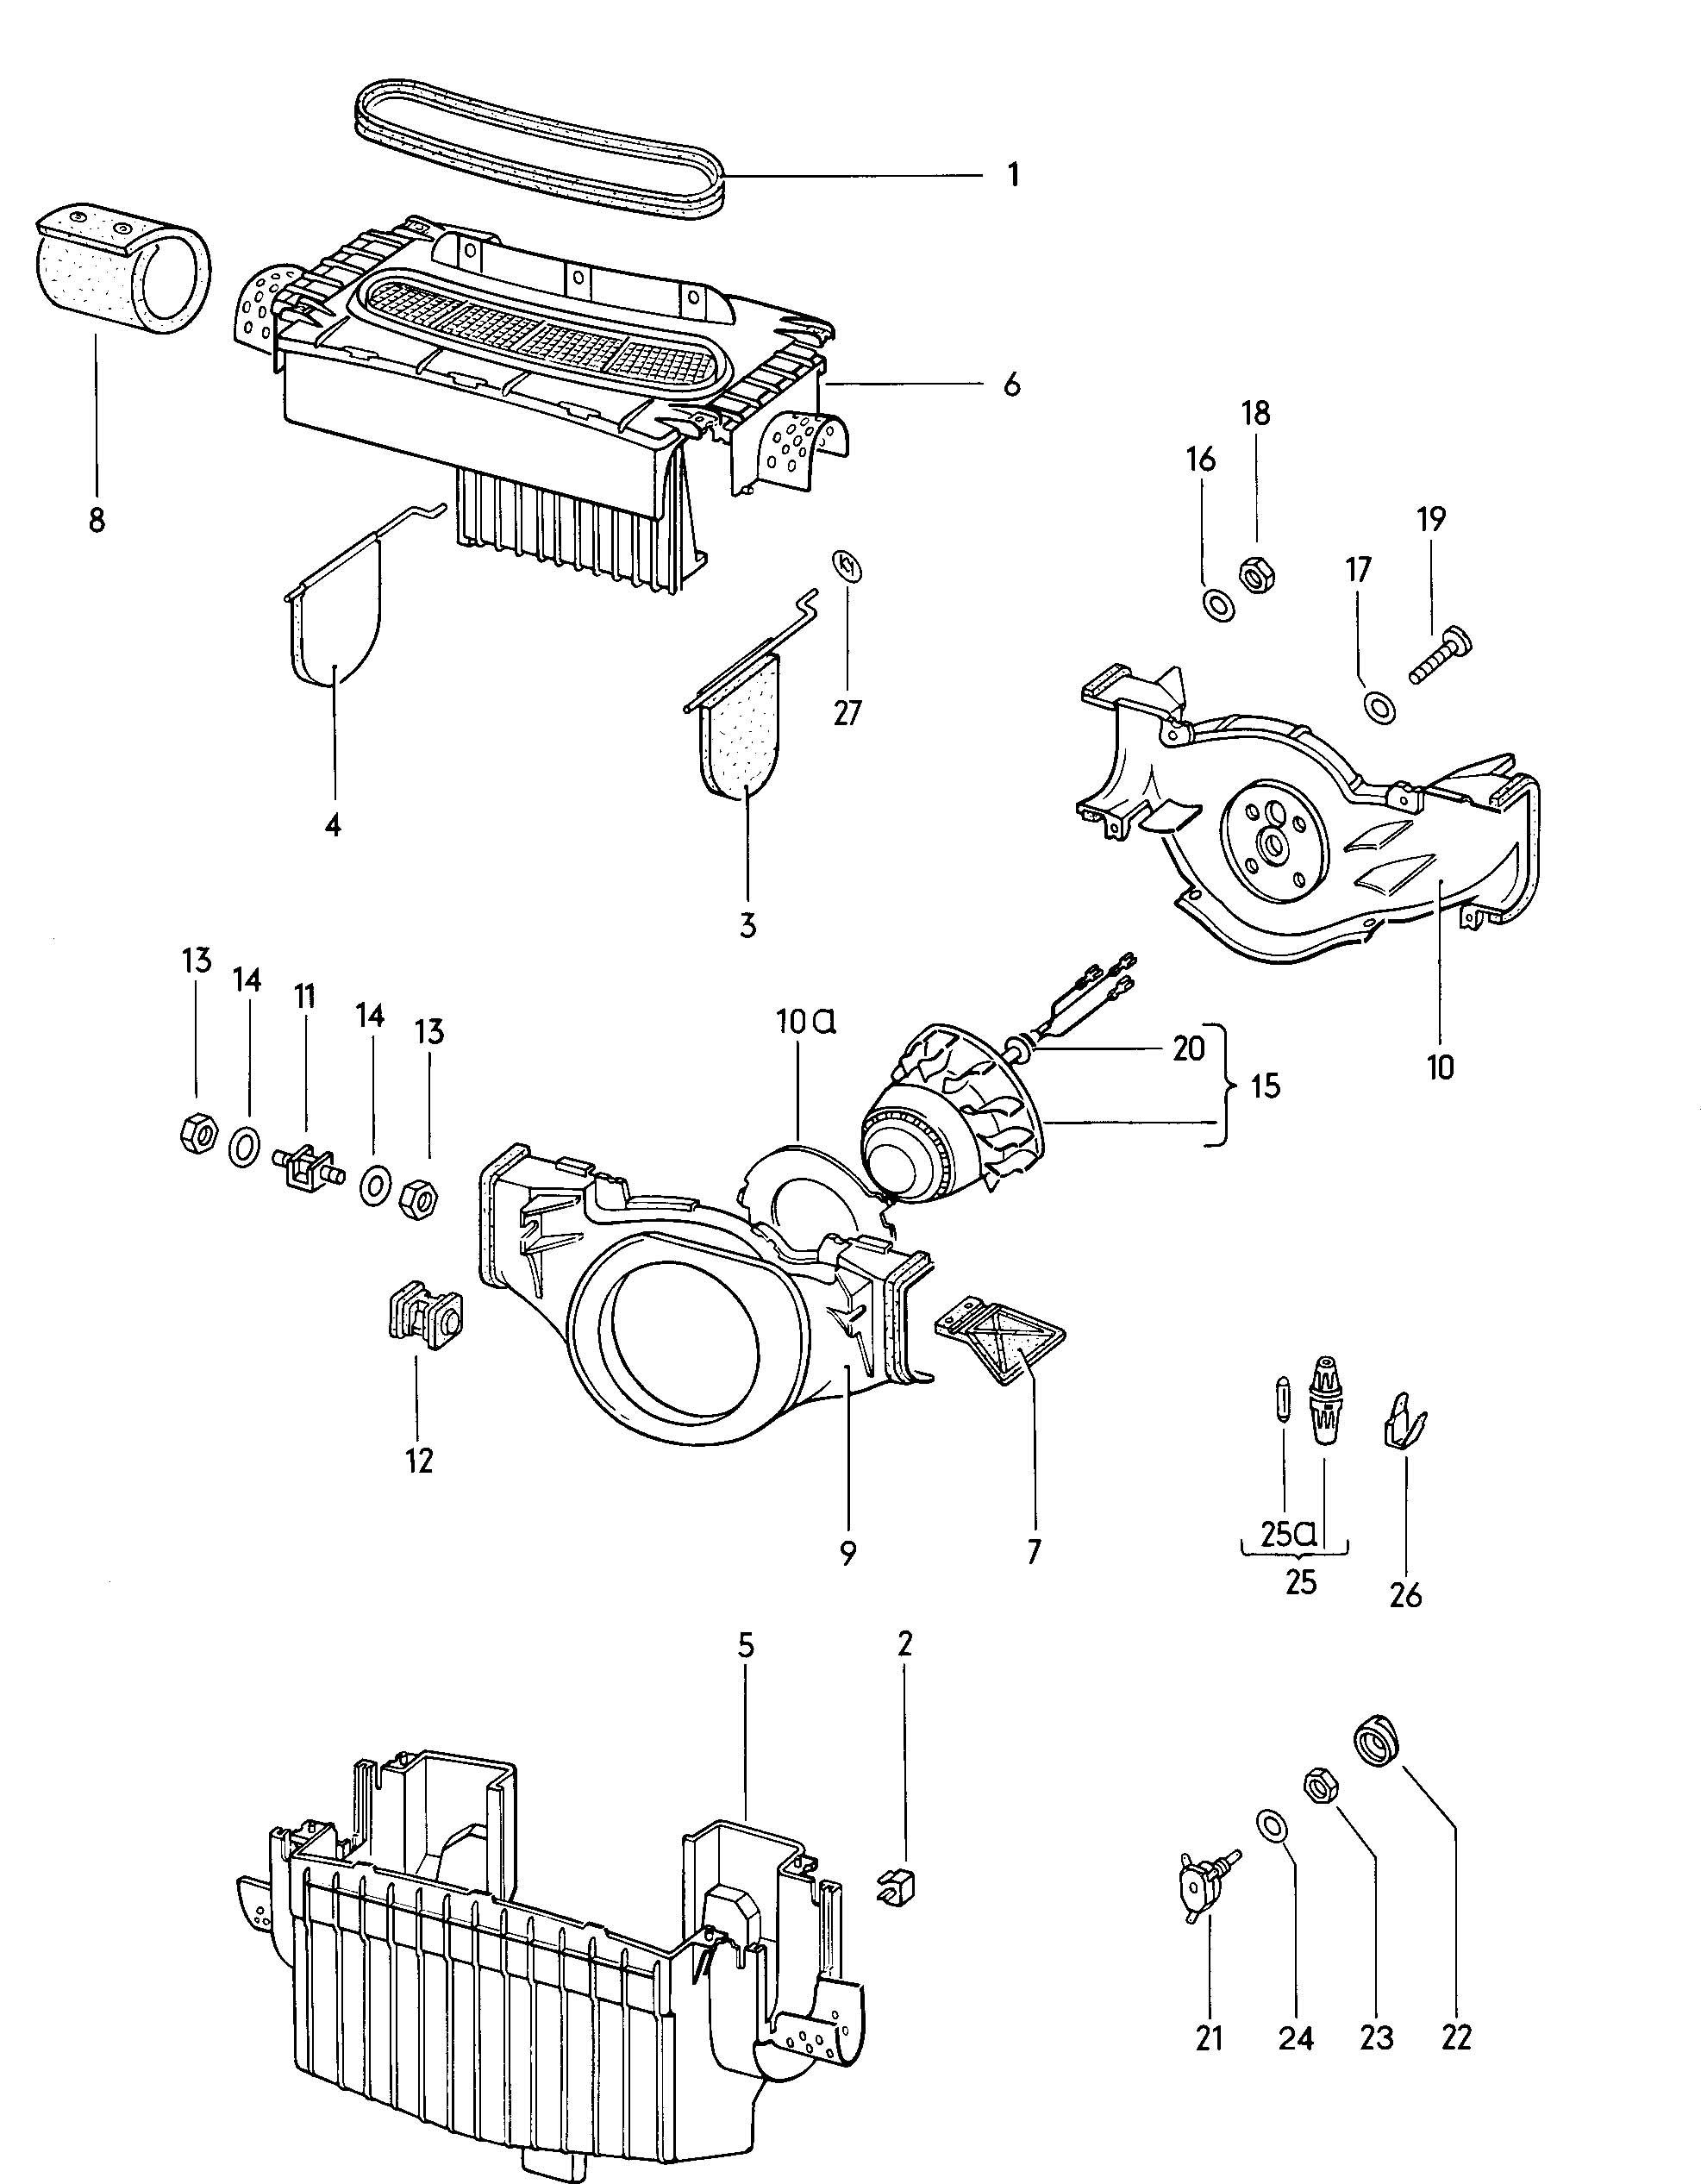 be hind box wiring diagram 1997 lincoln town car gloe